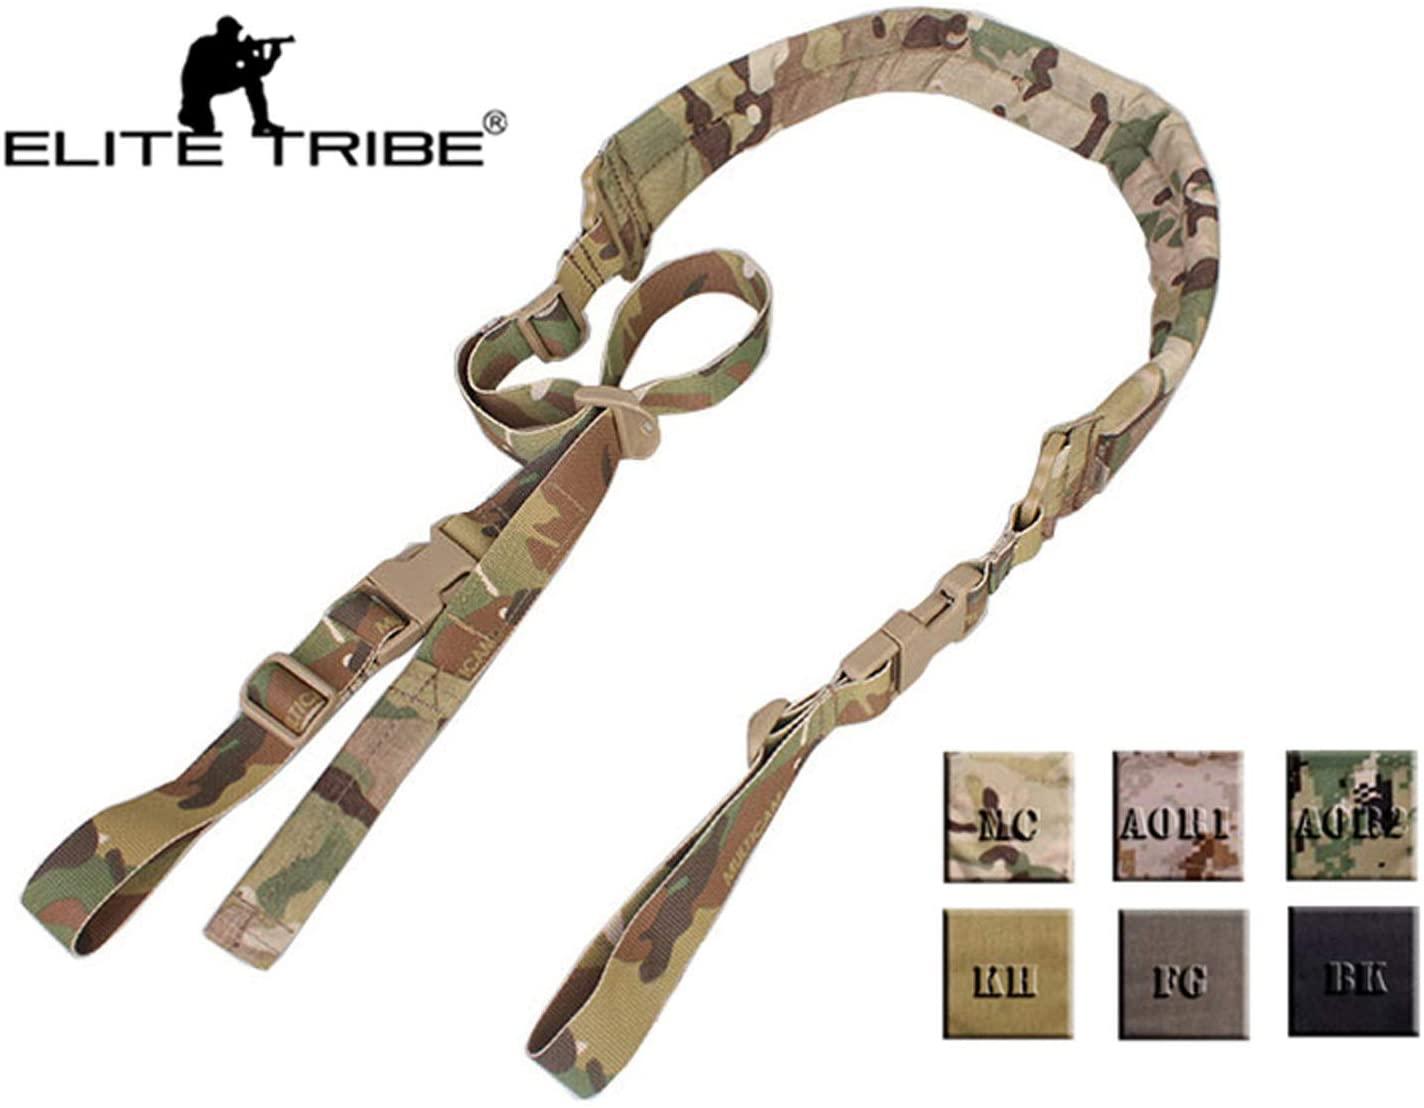 Tactical 2 Point Rifle Gun Sling Quick Adjustable Padded Shoulder Strap